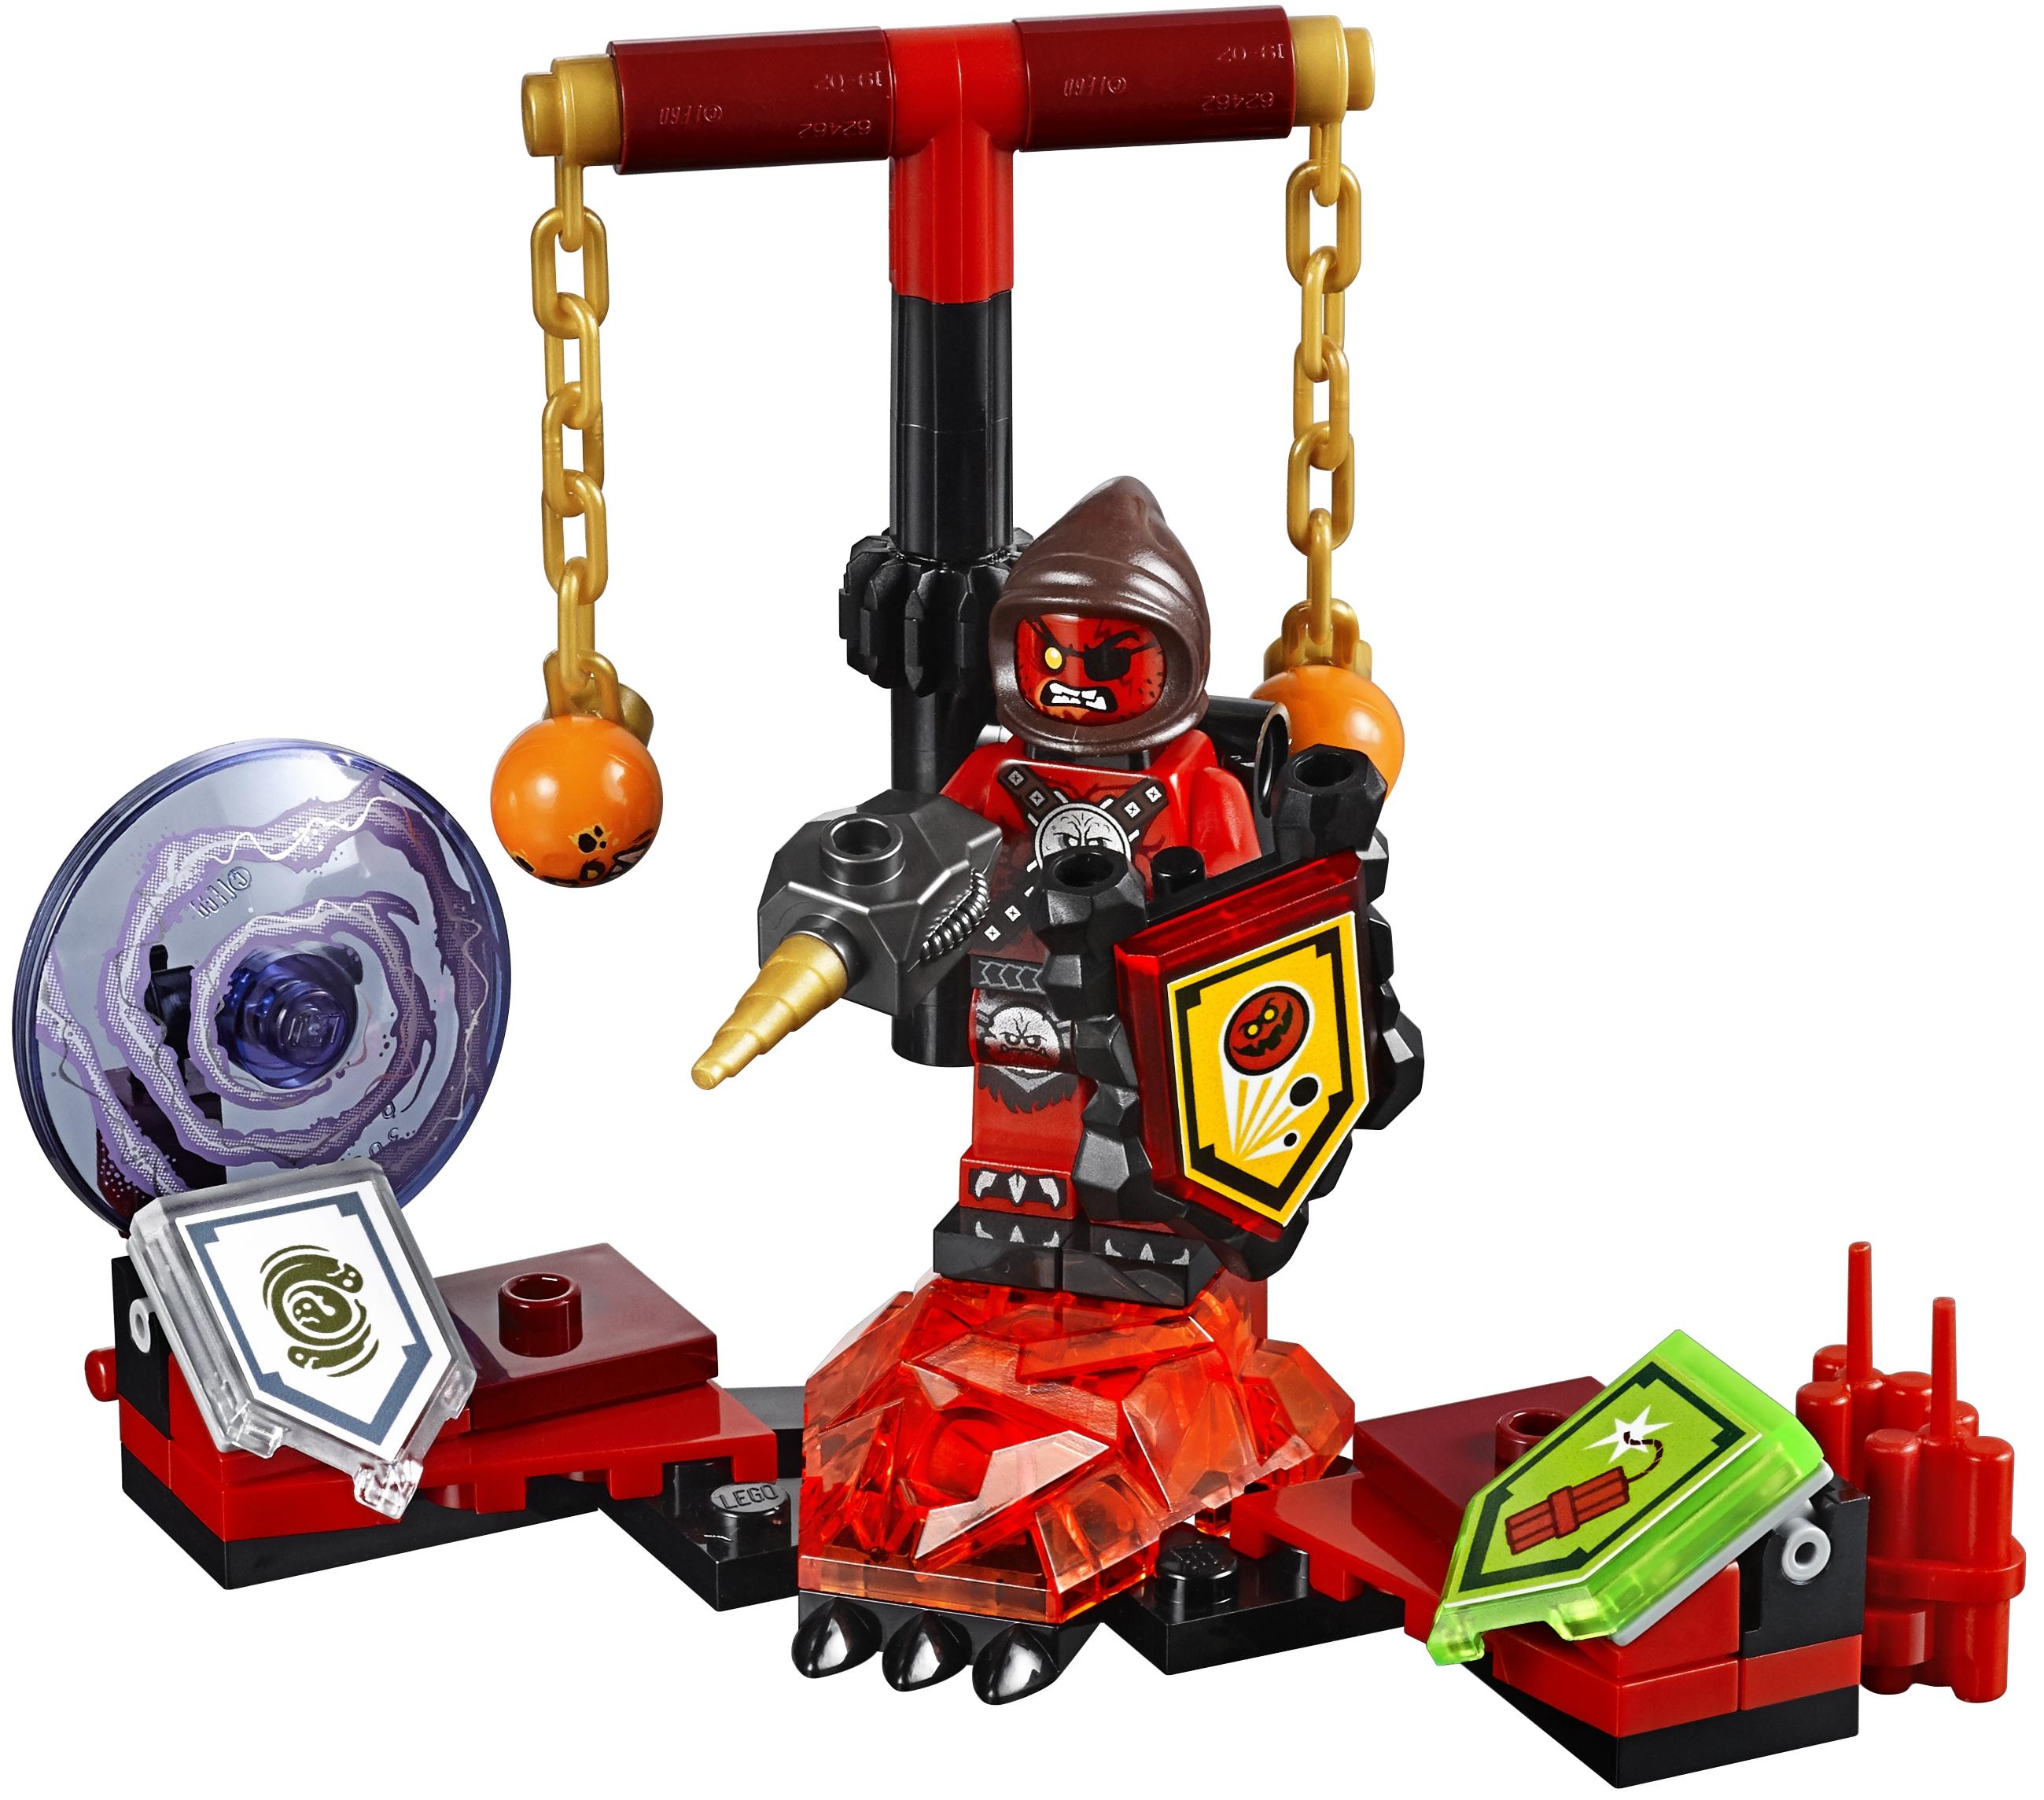 Конструктор LEGO Nexo Knights 70334 Предводитель монстров Абсолютная сила lepin nexo knights the fortrex combination marvel building blocks kits toys compatible legoe nexus